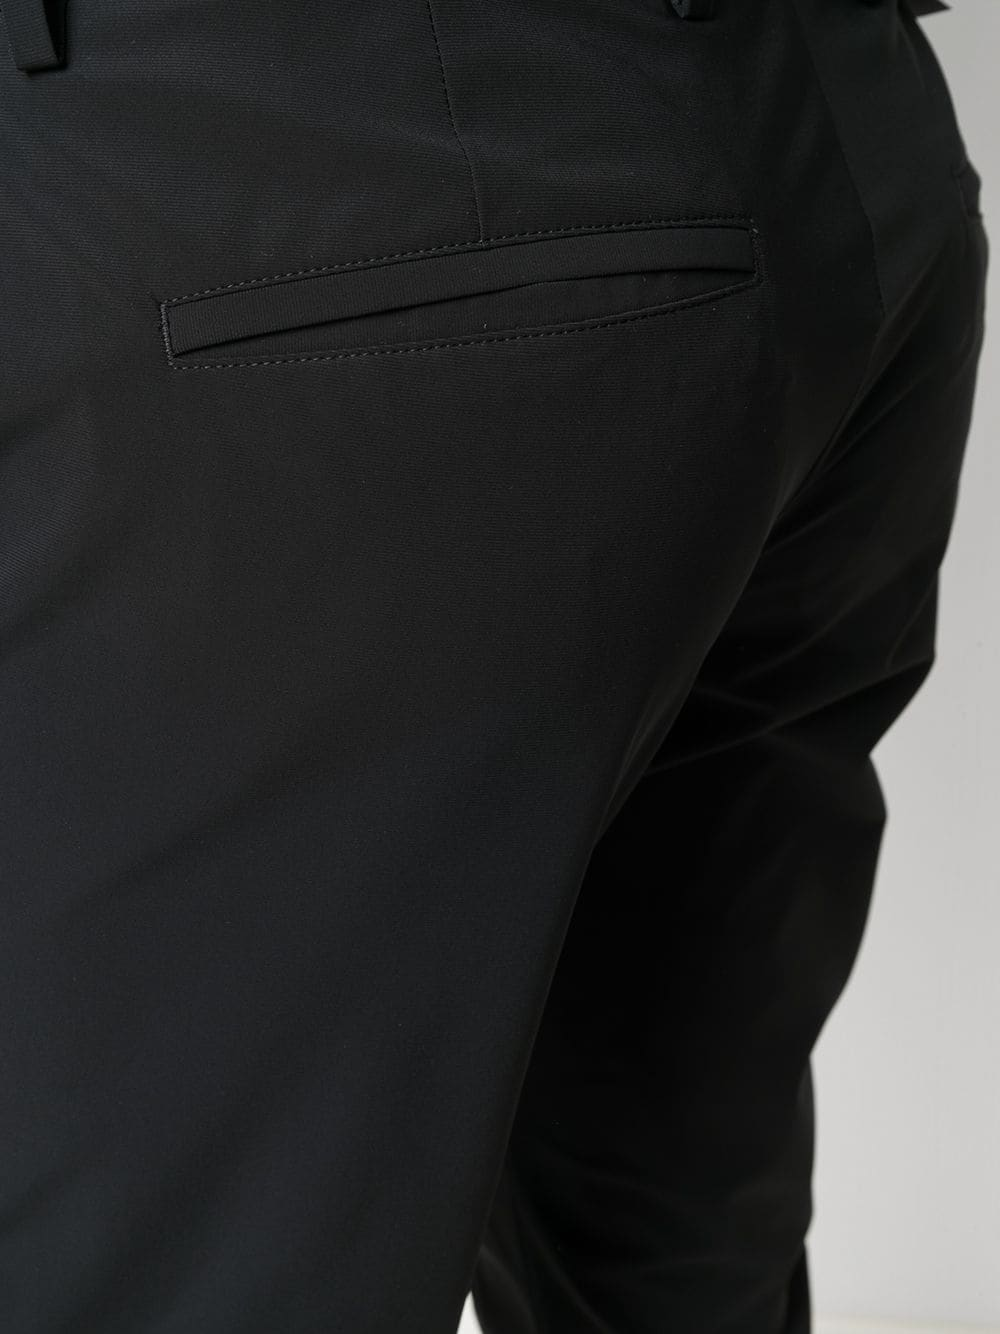 Pantaloni cropped neri slim fit con chiusura frontale nascosta PT01 | Pantaloni | COASEPZ10KLT-CV070990